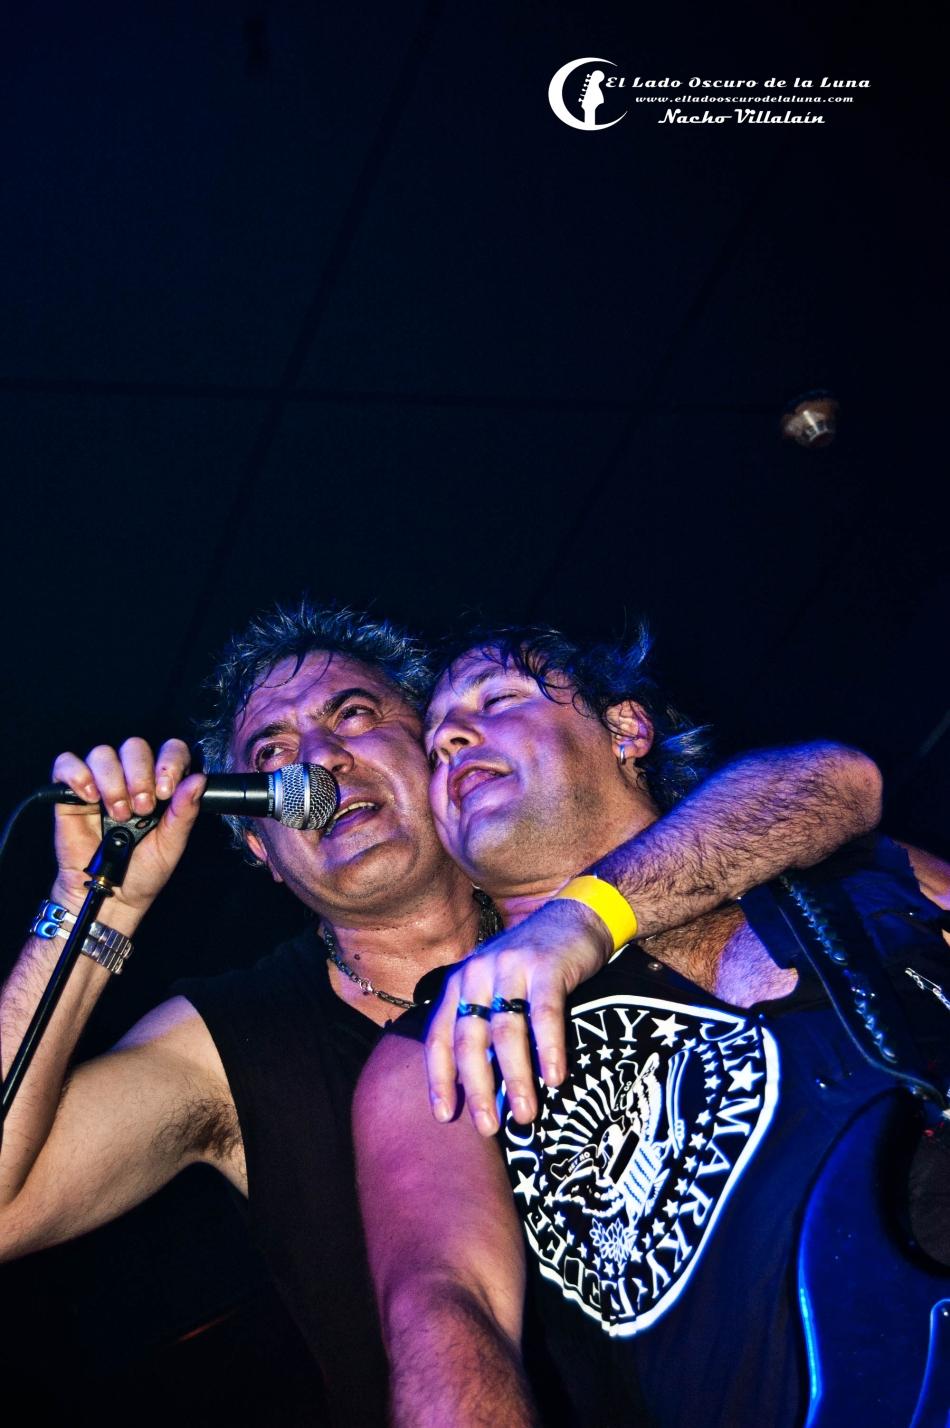 Fotografia: Nacho Devillala